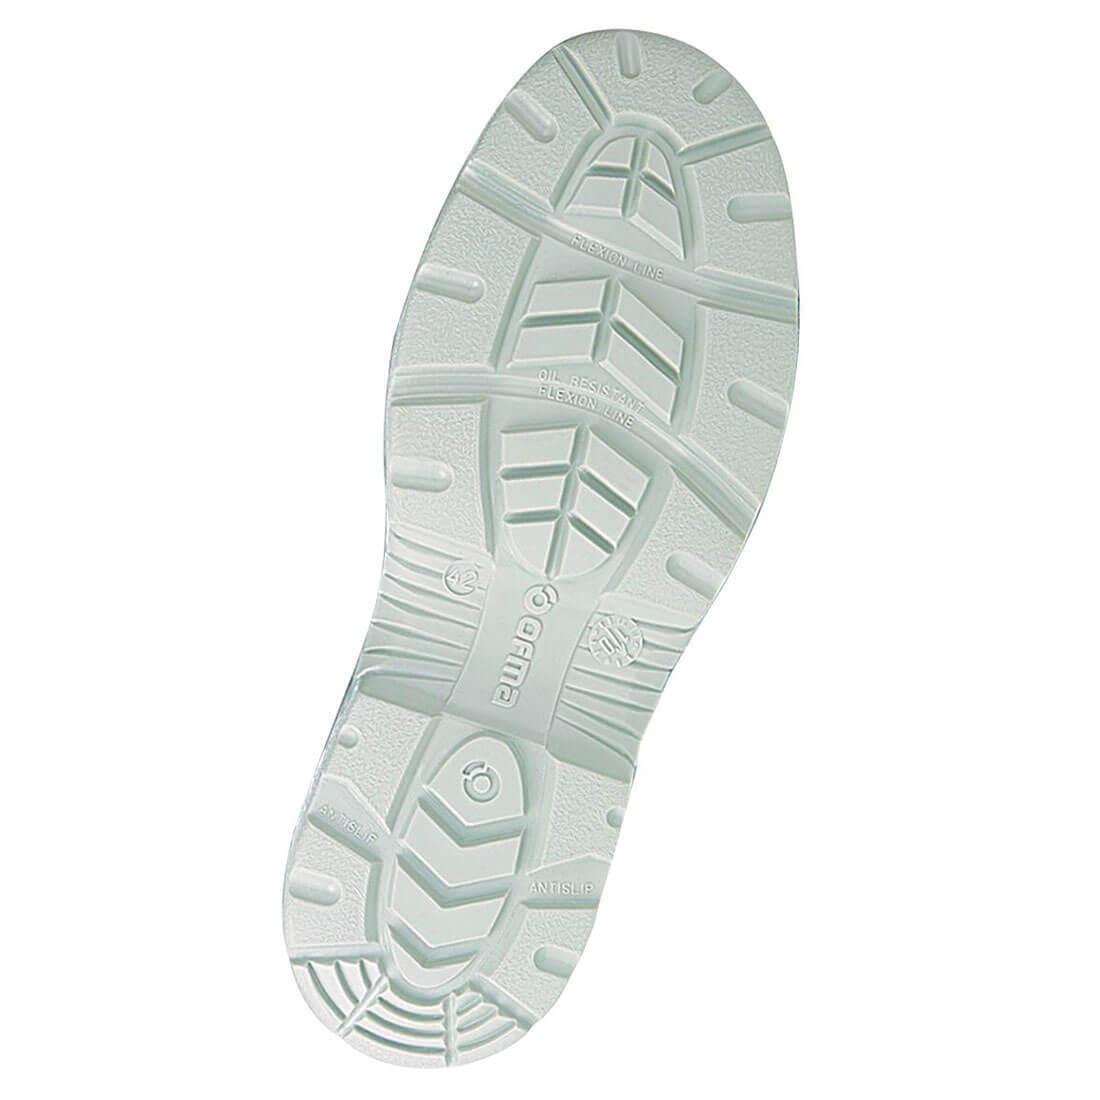 Pantof Odin S3 + CI + SRC - Incaltaminte de protectie